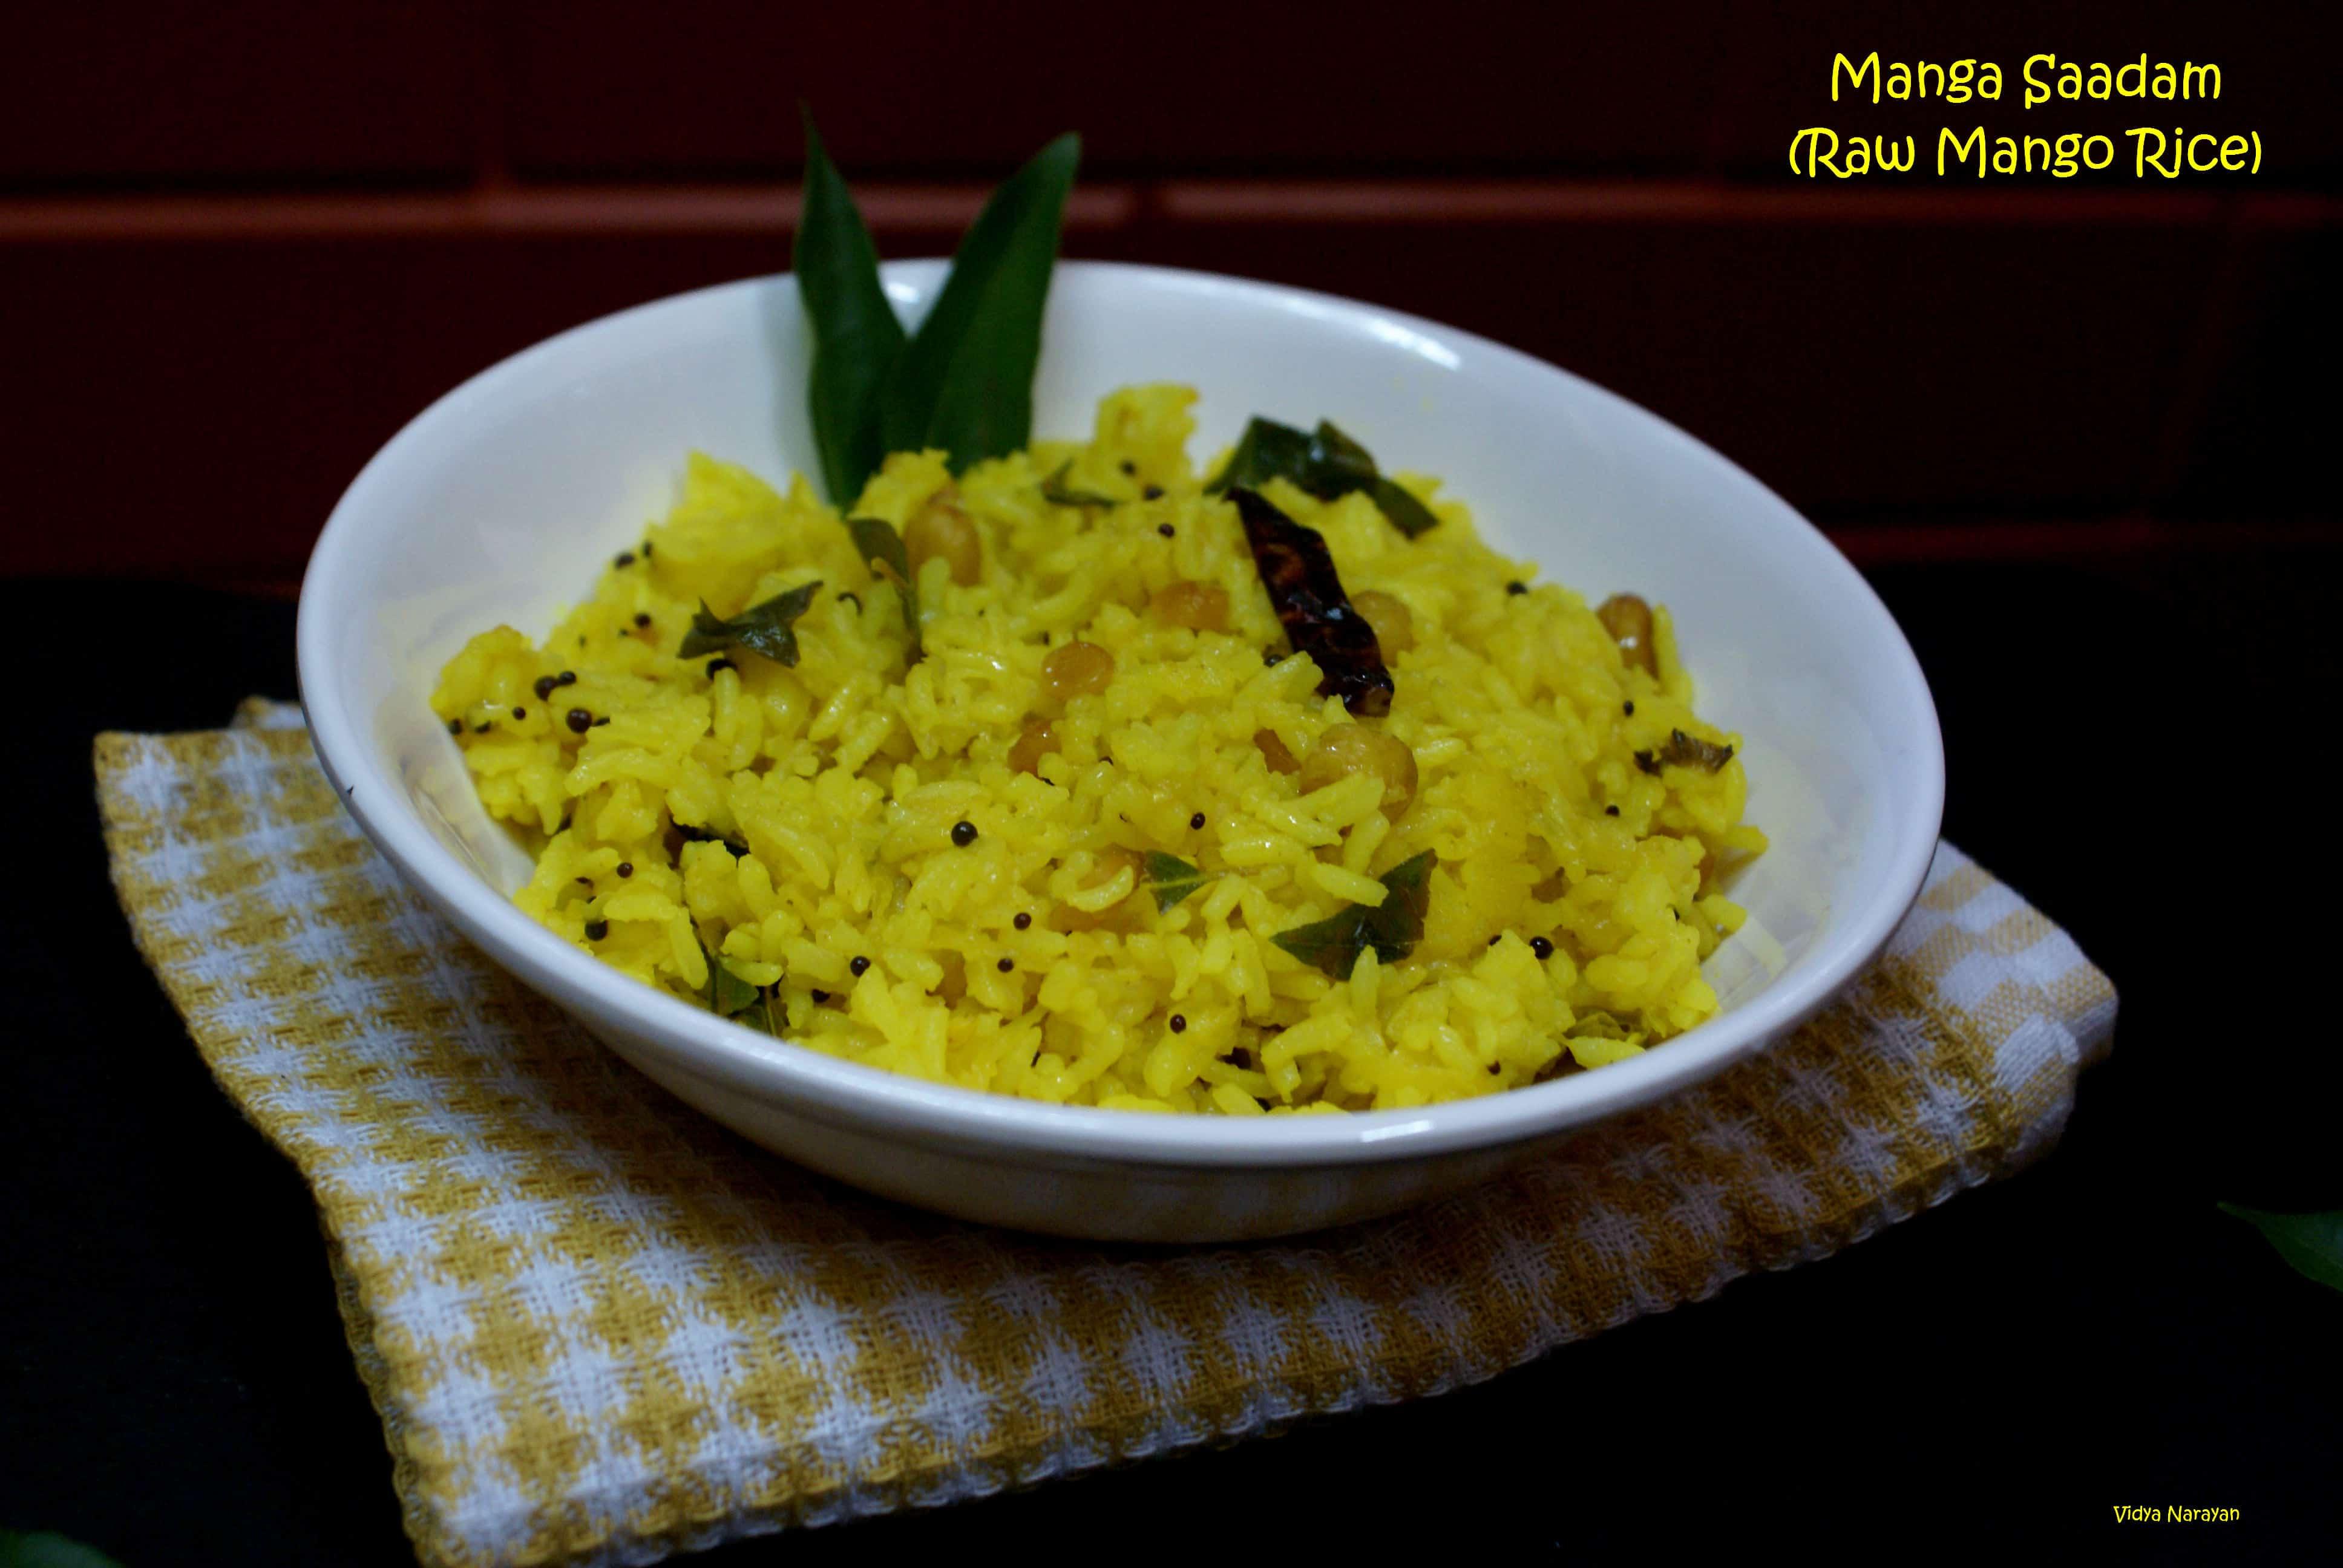 Manga Sadam / Raw Mango Rice